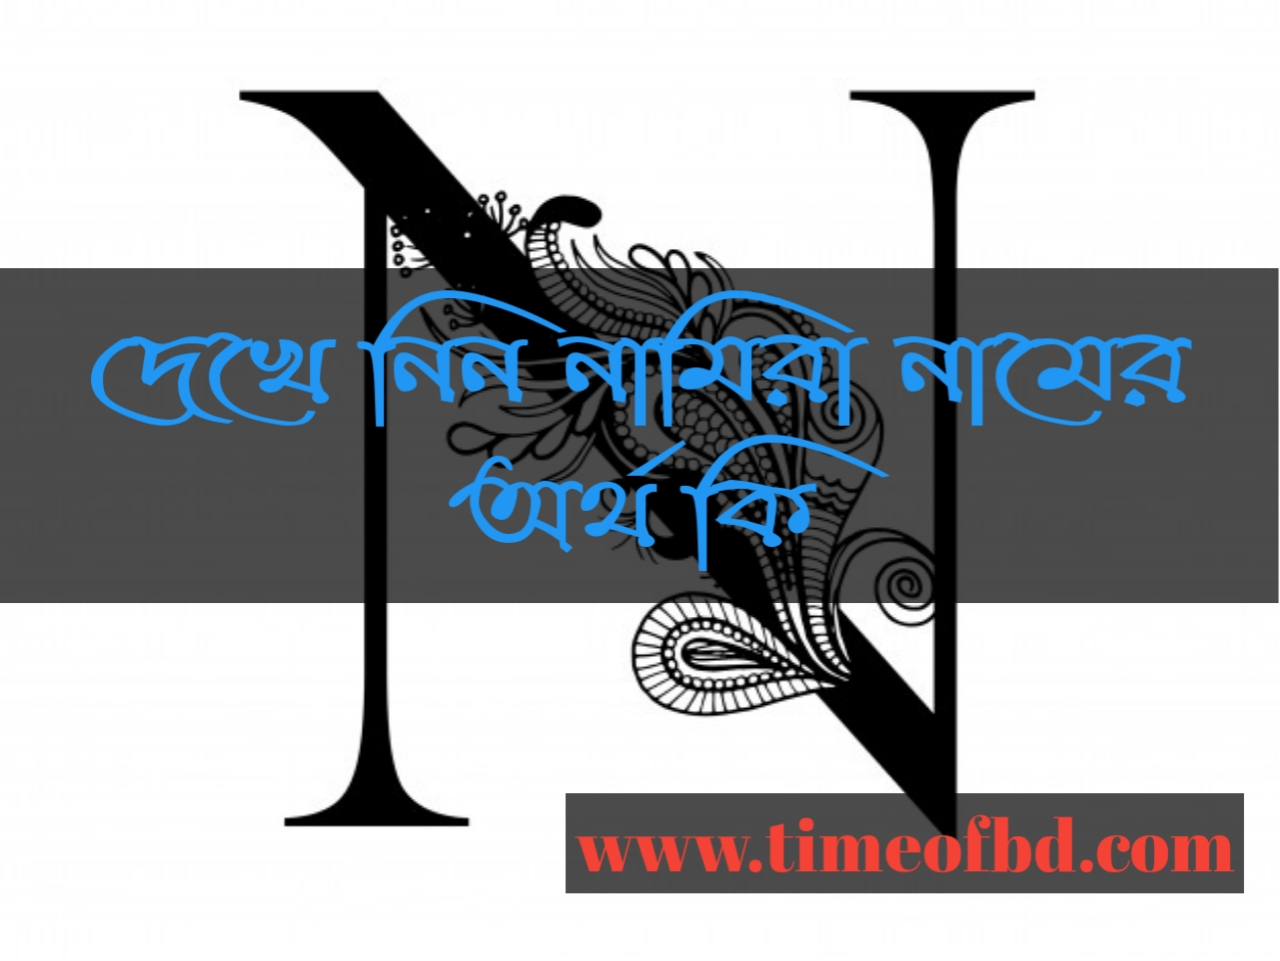 Namira name meaning in Bengali, নামিরা নামের অর্থ কি, নামিরা নামের বাংলা অর্থ কি, নামিরা নামের ইসলামিক অর্থ কি,